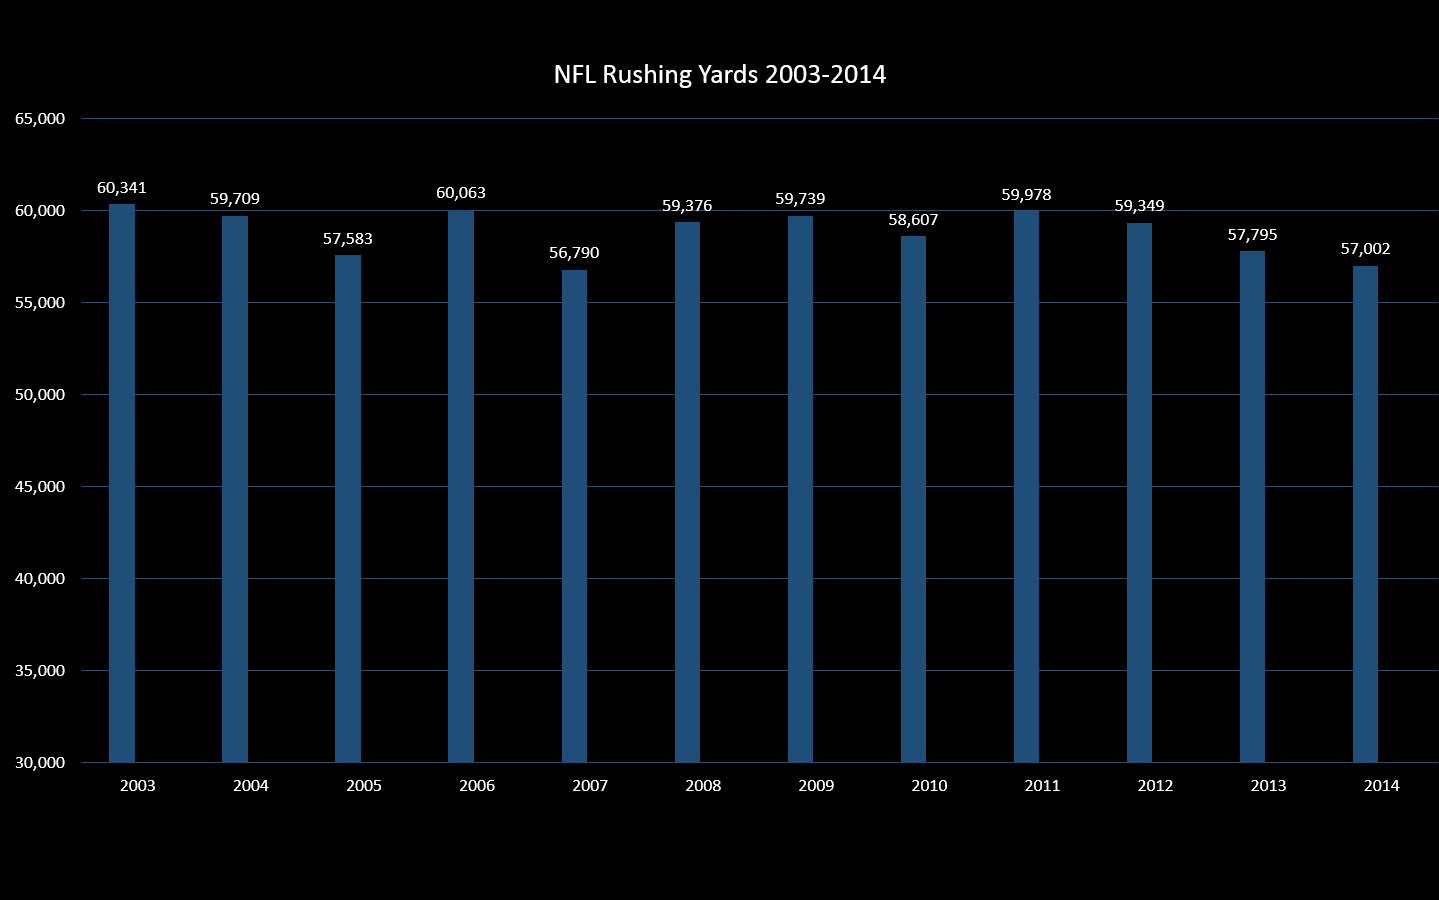 NFL Rushing Yard 2003-2014